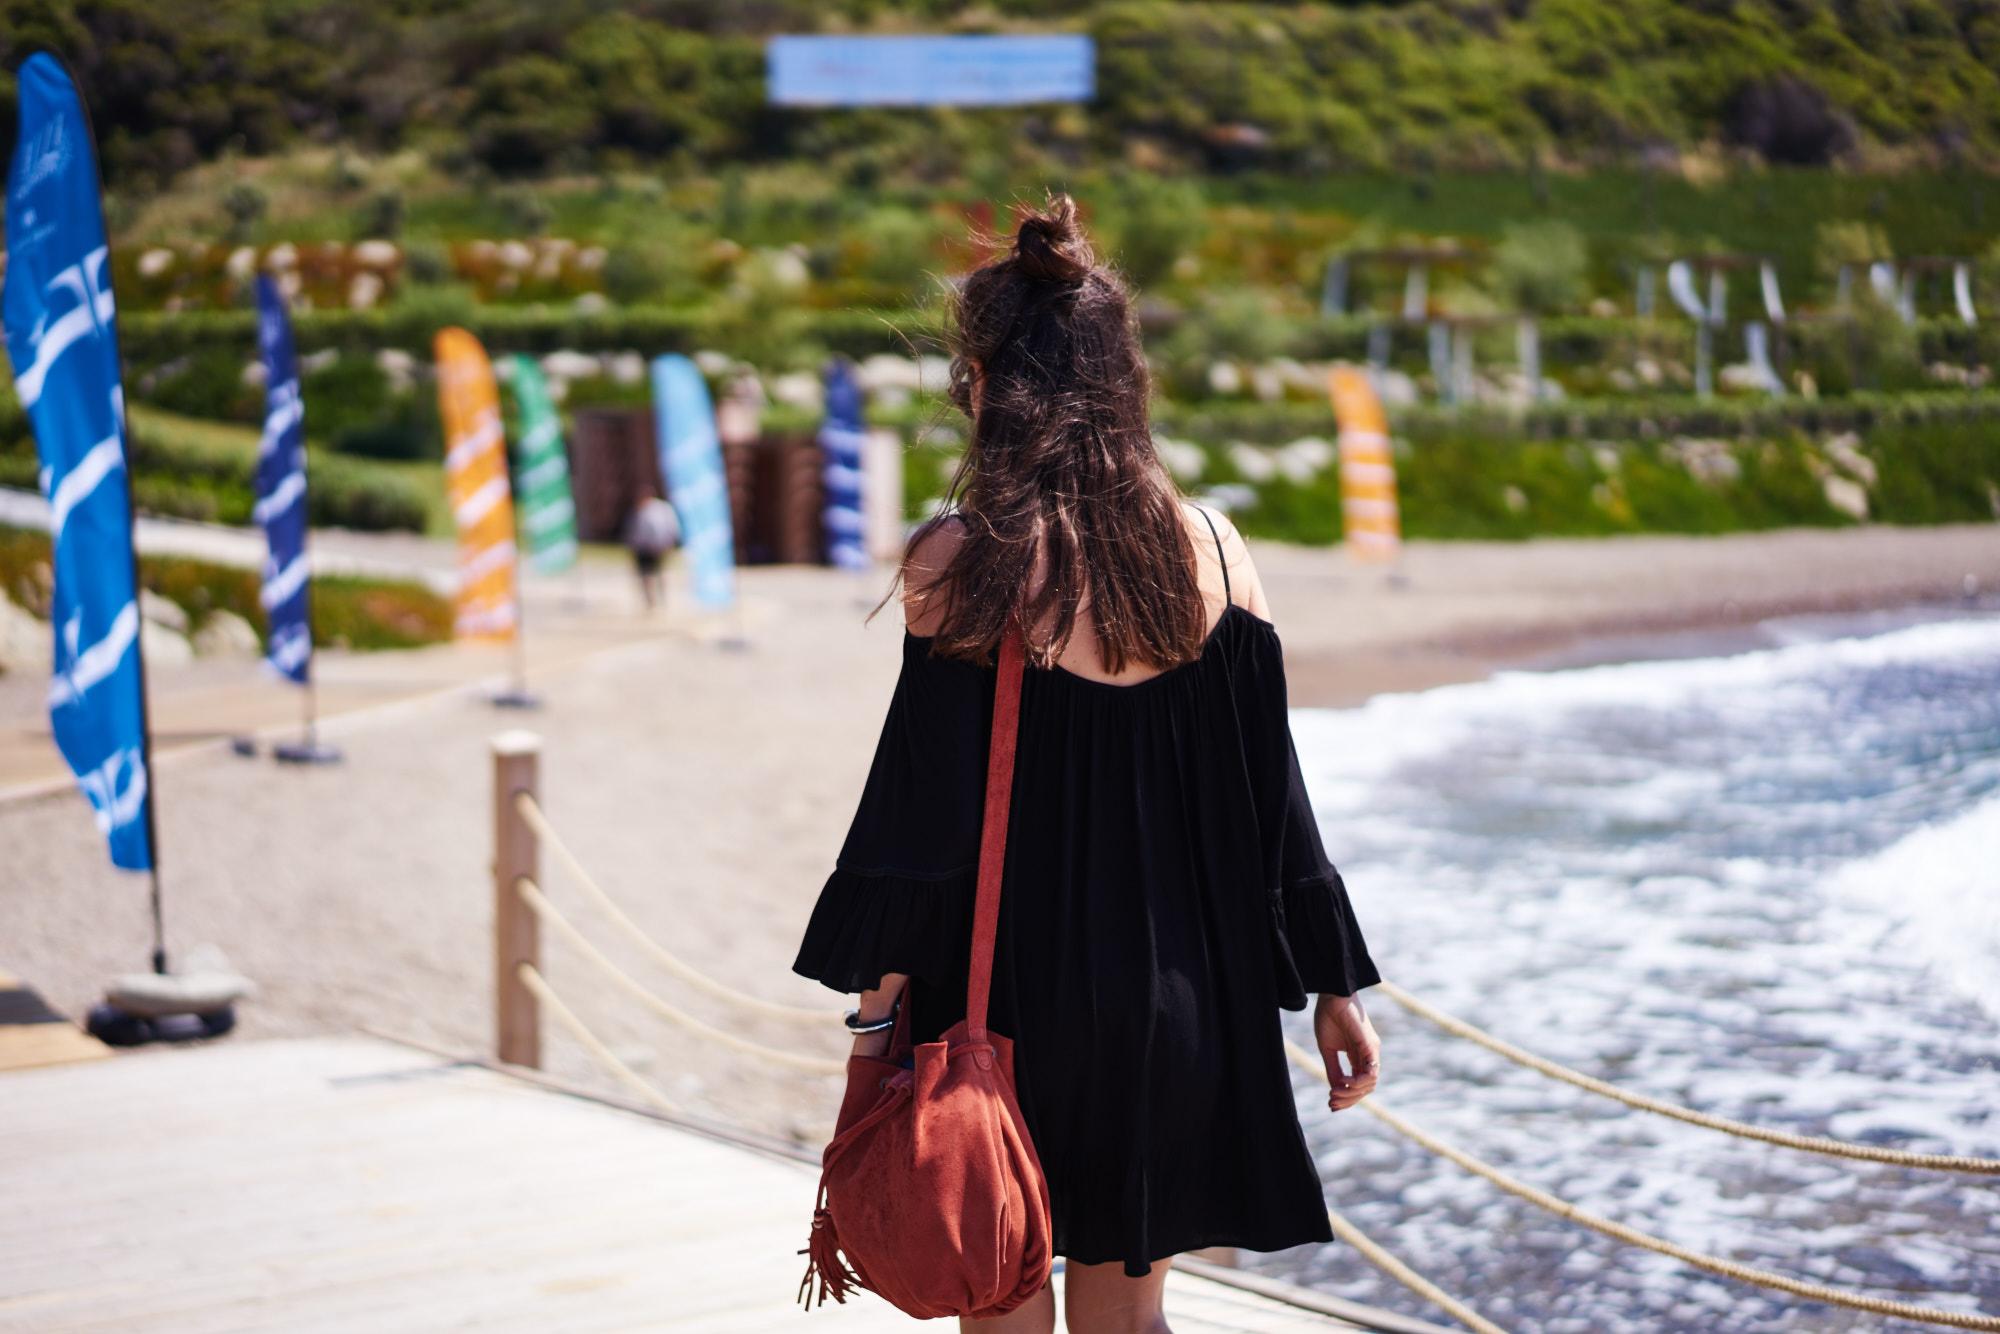 billur saatci, offnegiysem, street style, turkish style blogger, elle weekend, bodrum, black, beachwear, koton, koton beach wear, bershka, kopajos sunglasses